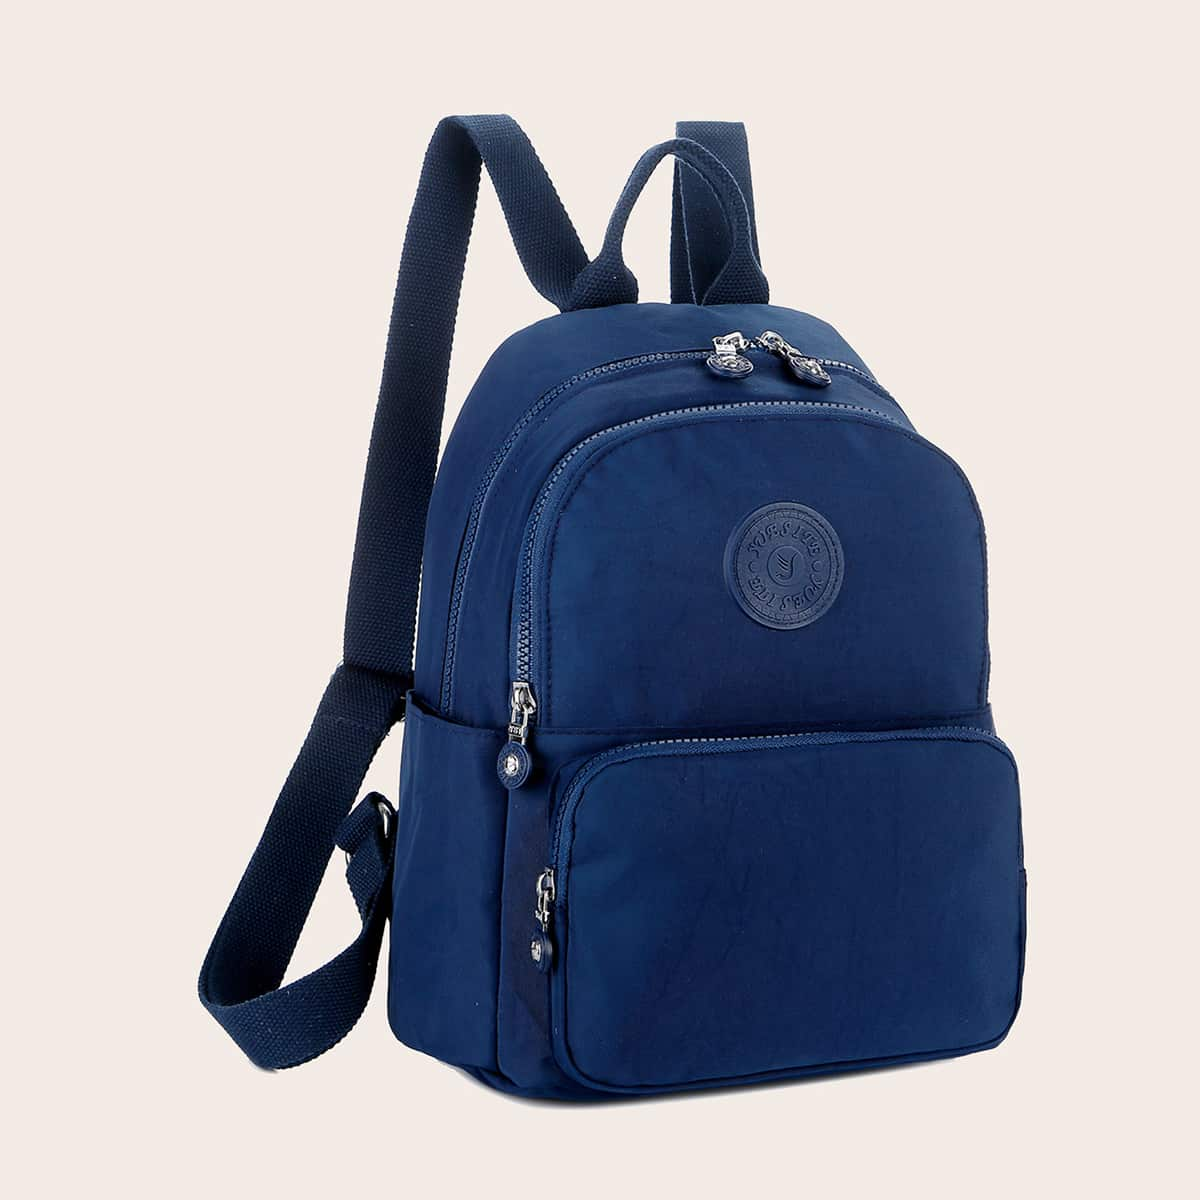 Минималистский рюкзак с карманом